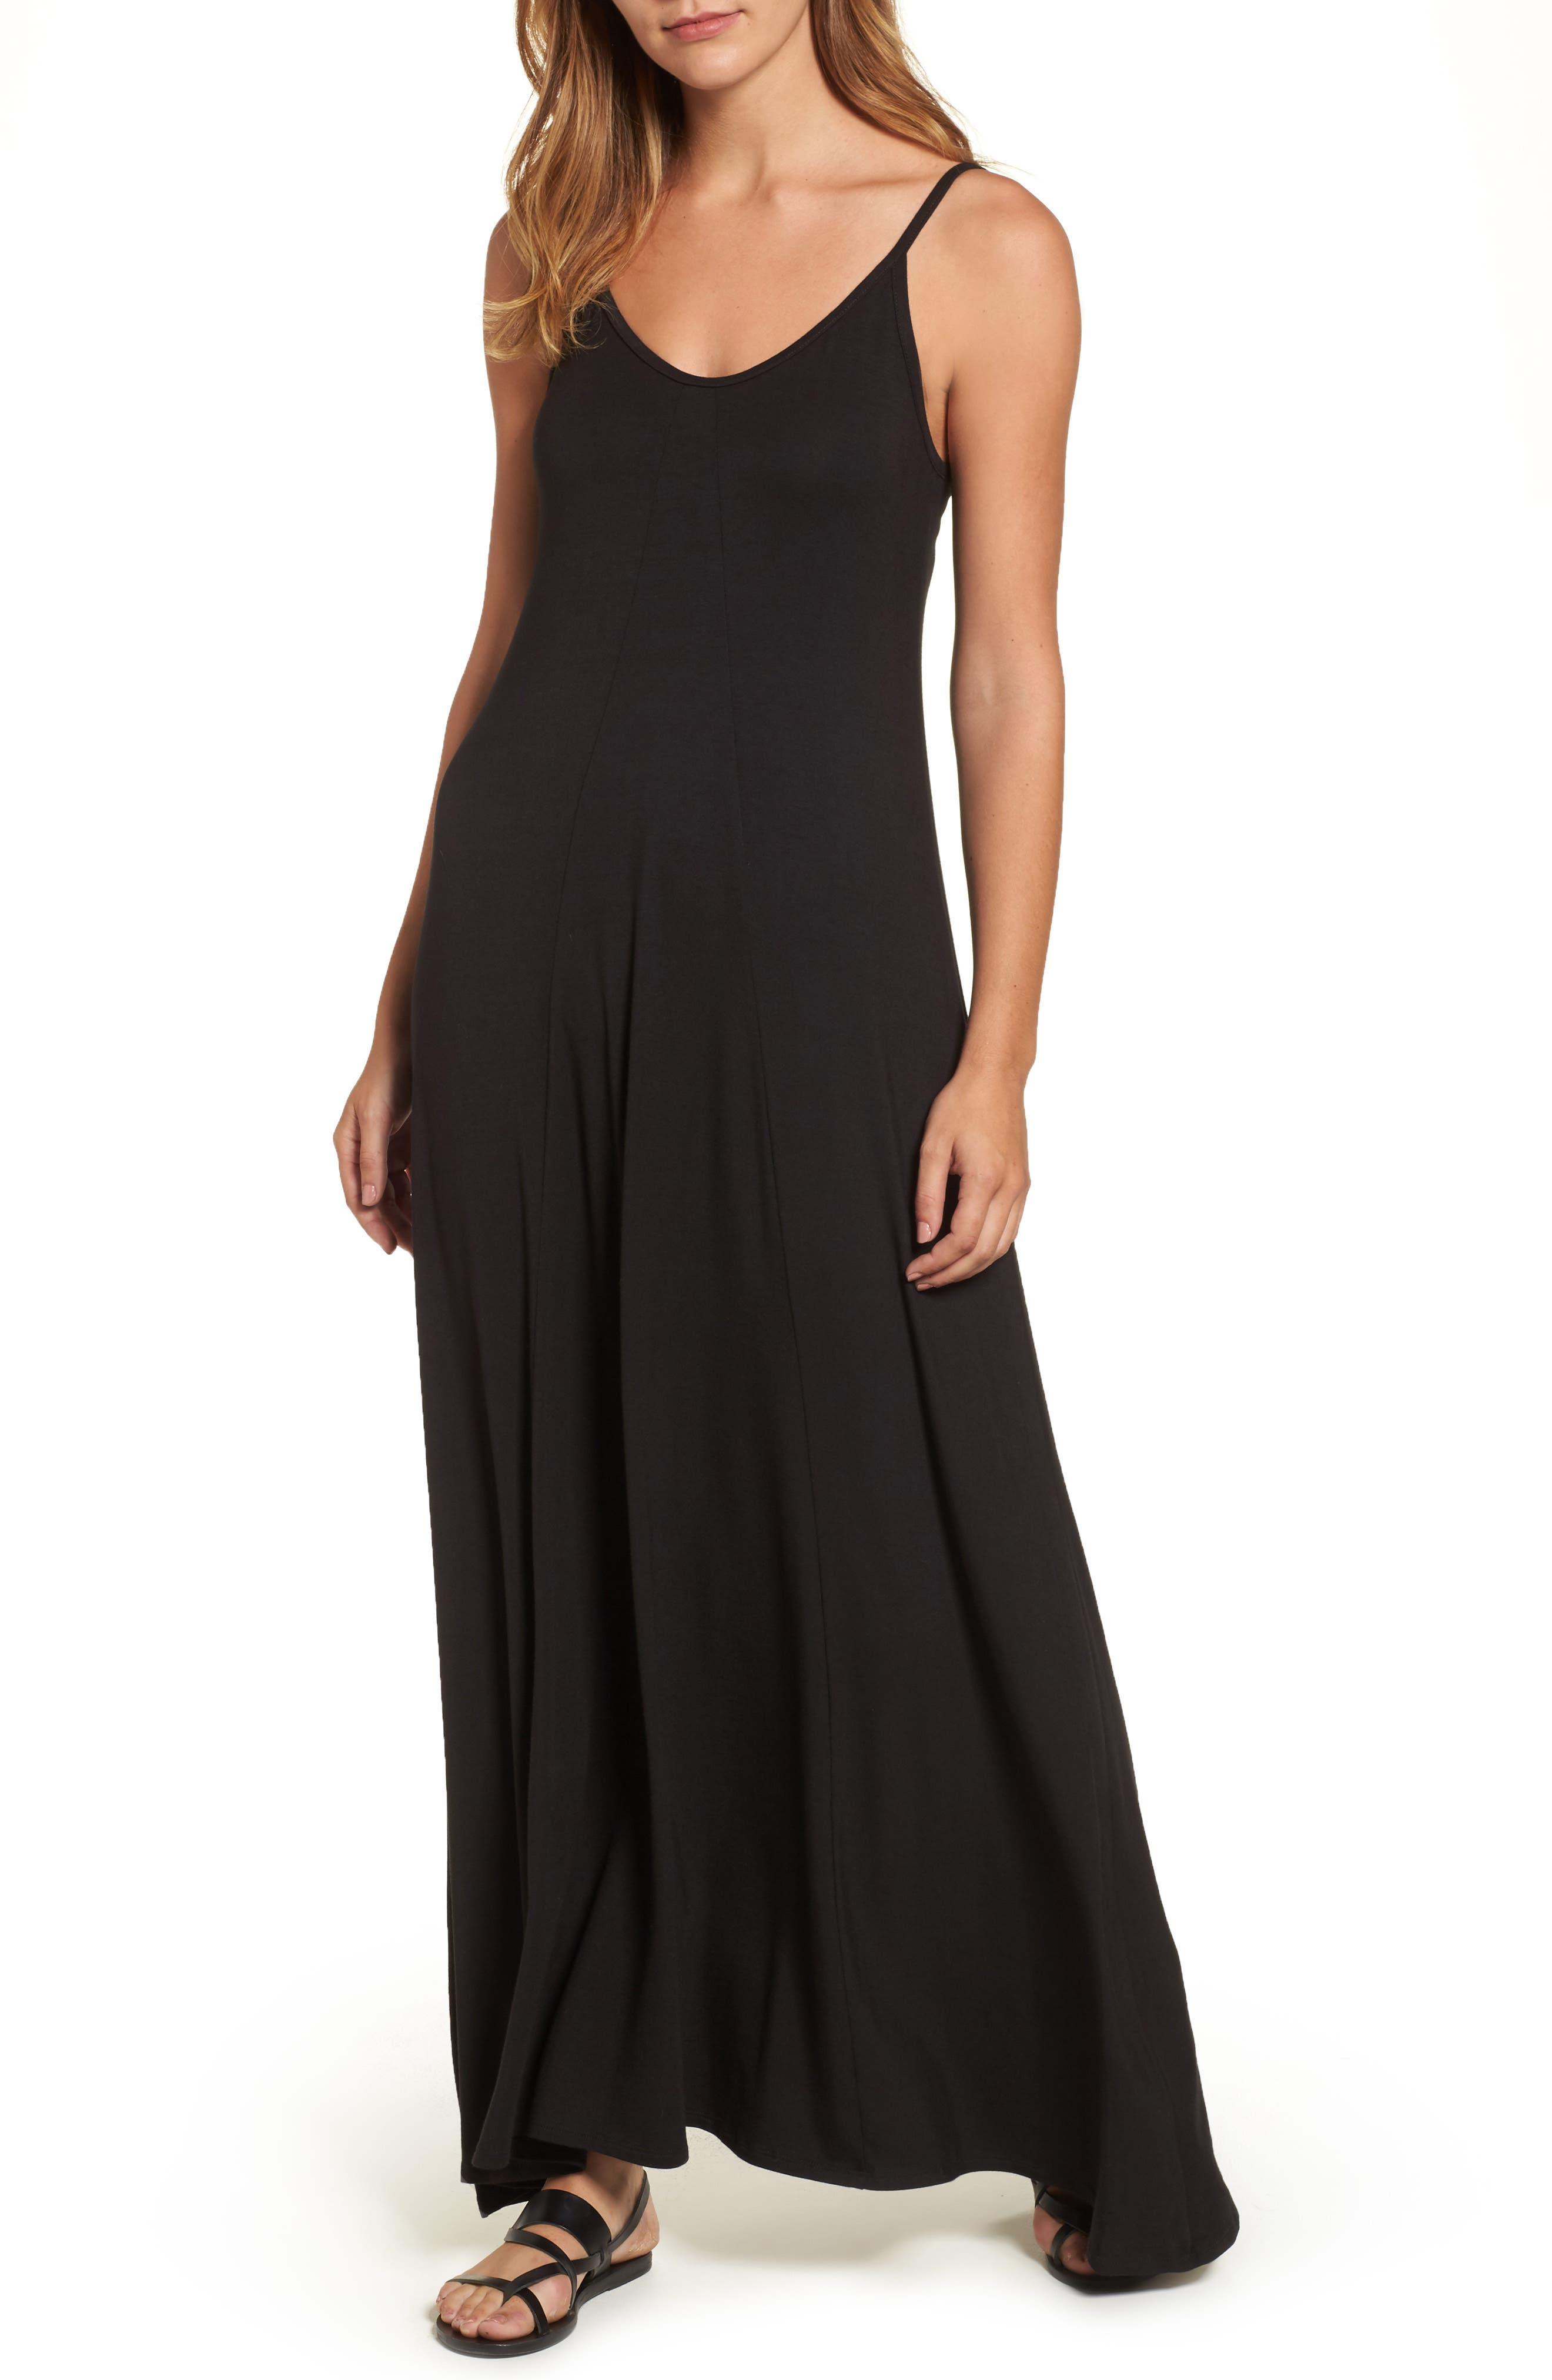 Petite Loveappella Knit Maxi Dress, Black